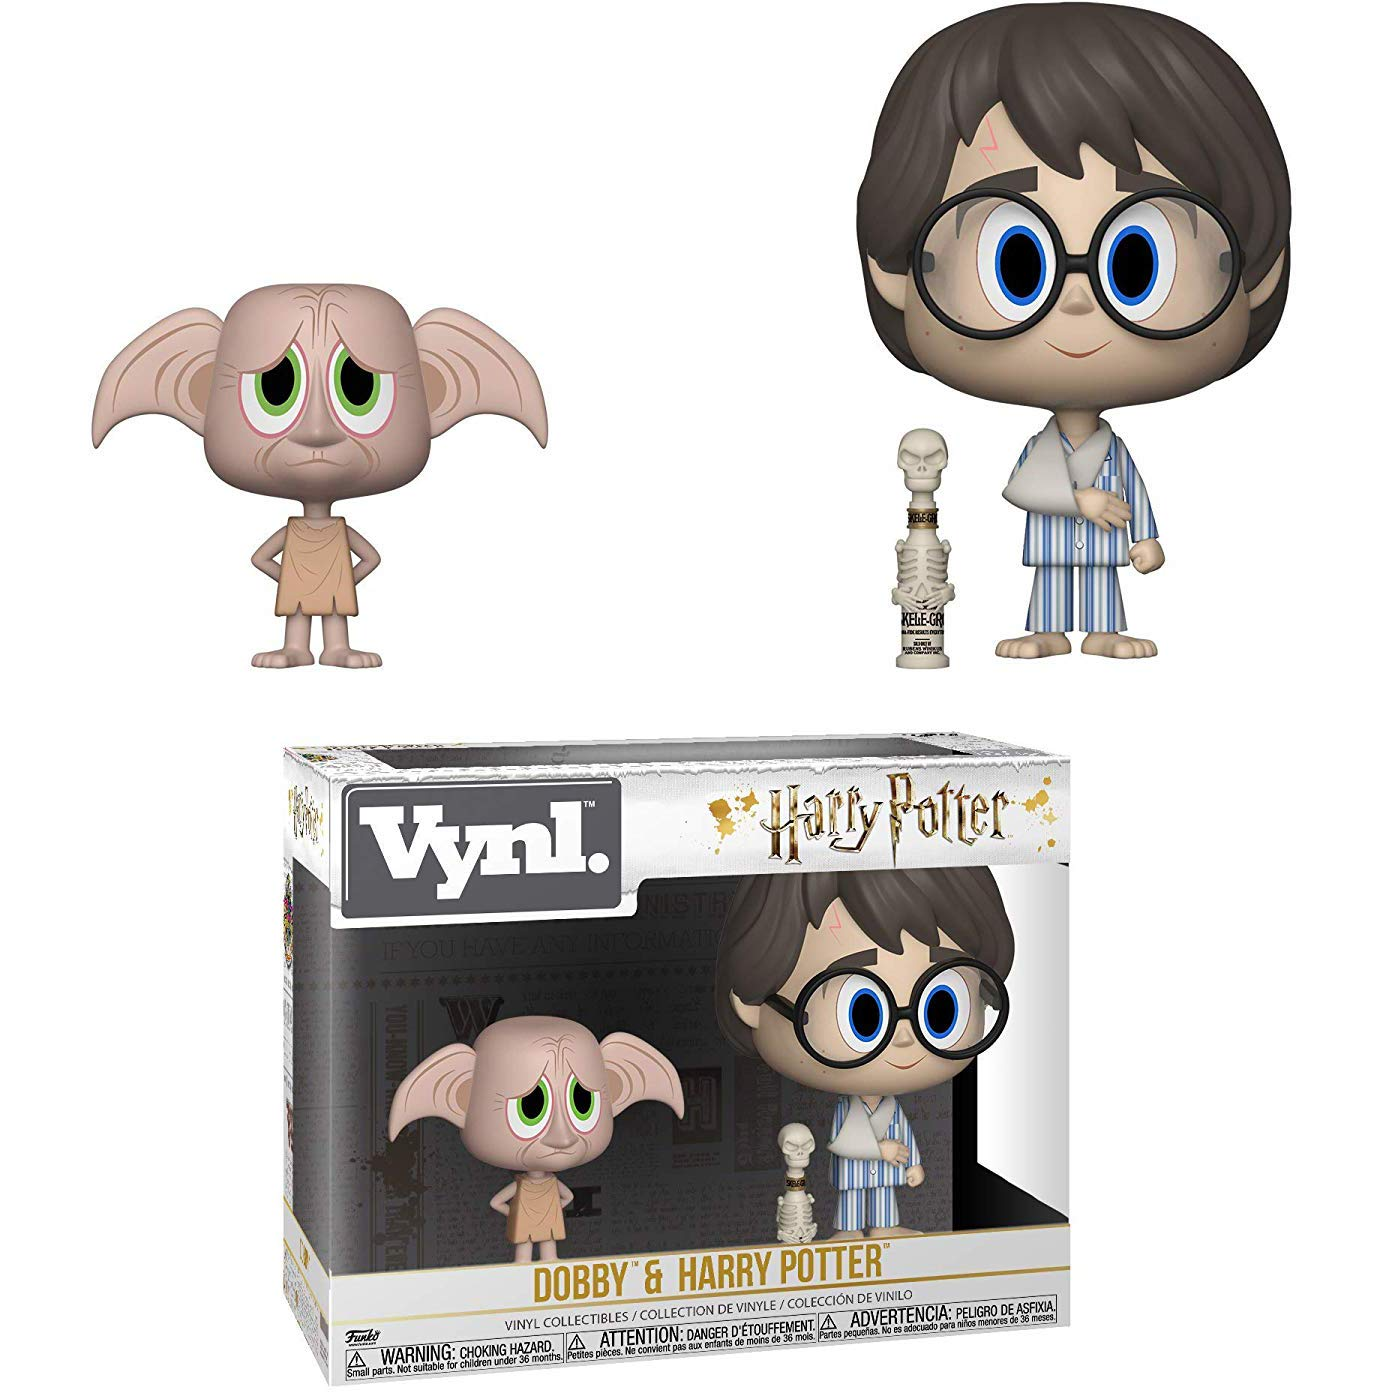 Vinyl Figure Set 1 Official Harry Potter Trading Card Bundle Funko Dobby /& Harry Potter: Harry Potter x Vynl BCC940J96 31001